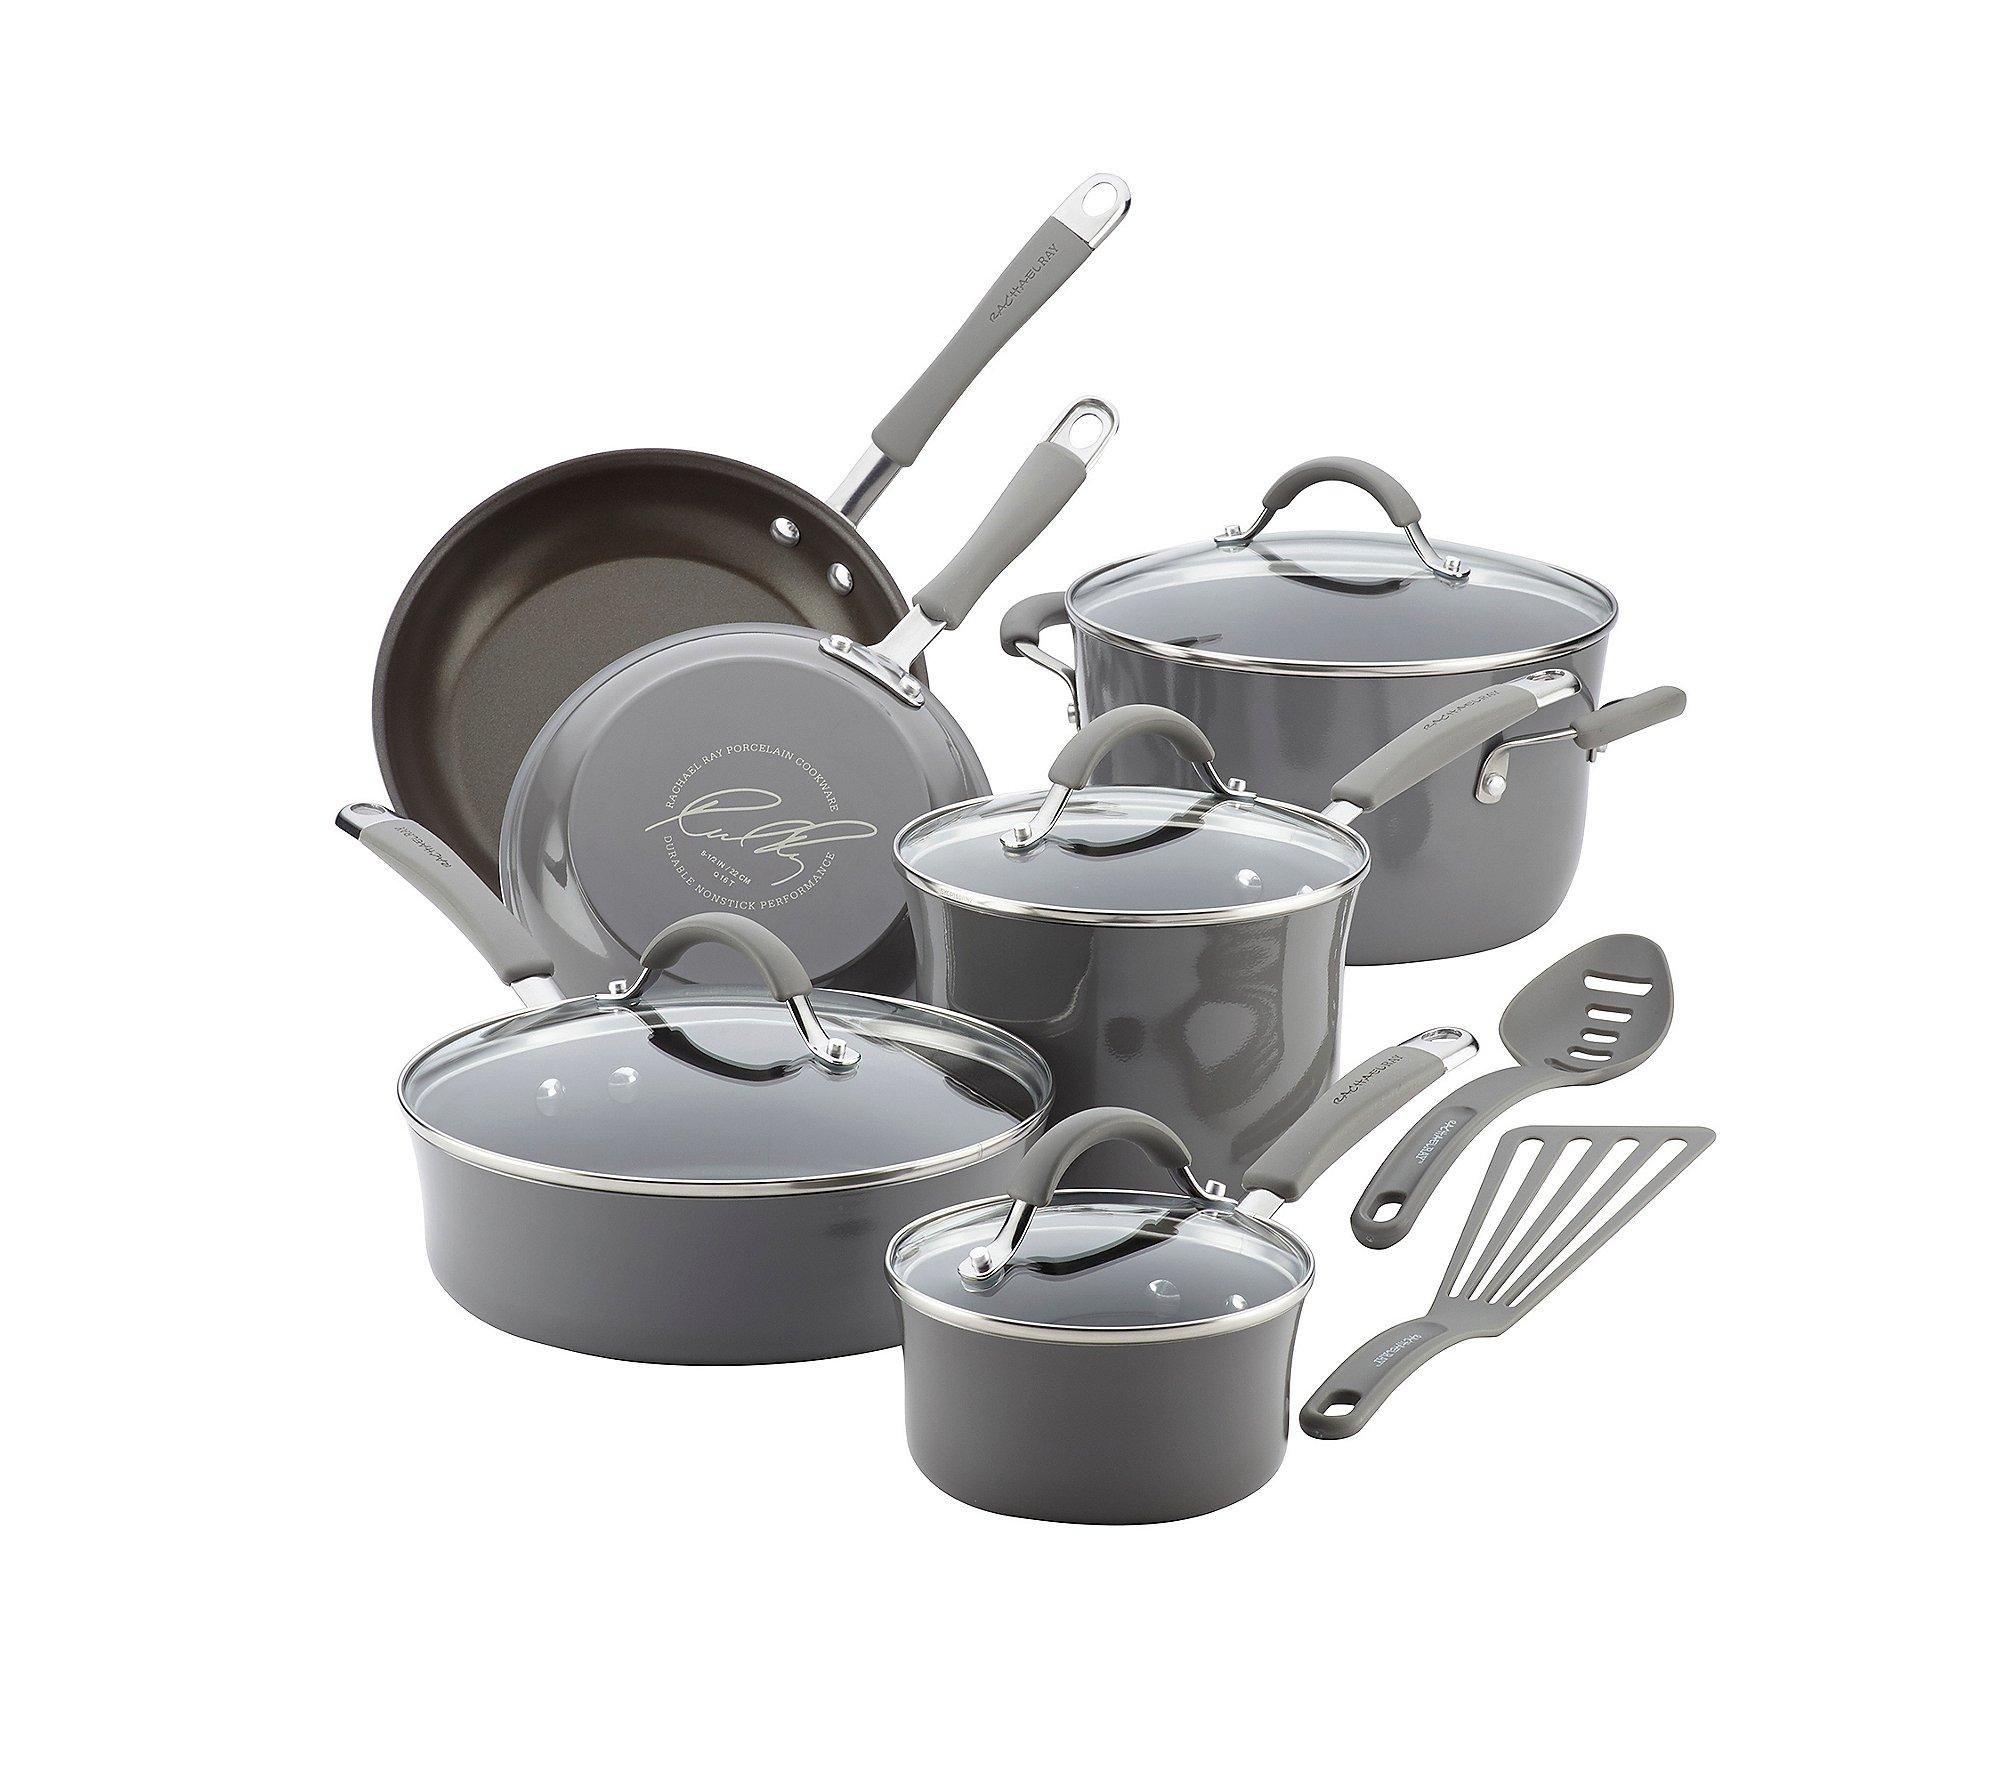 Rachael Ray Cucina Hard Porcelain Enamel Nonstick Cookware Set, 12-Piece 71dxqHwOo L